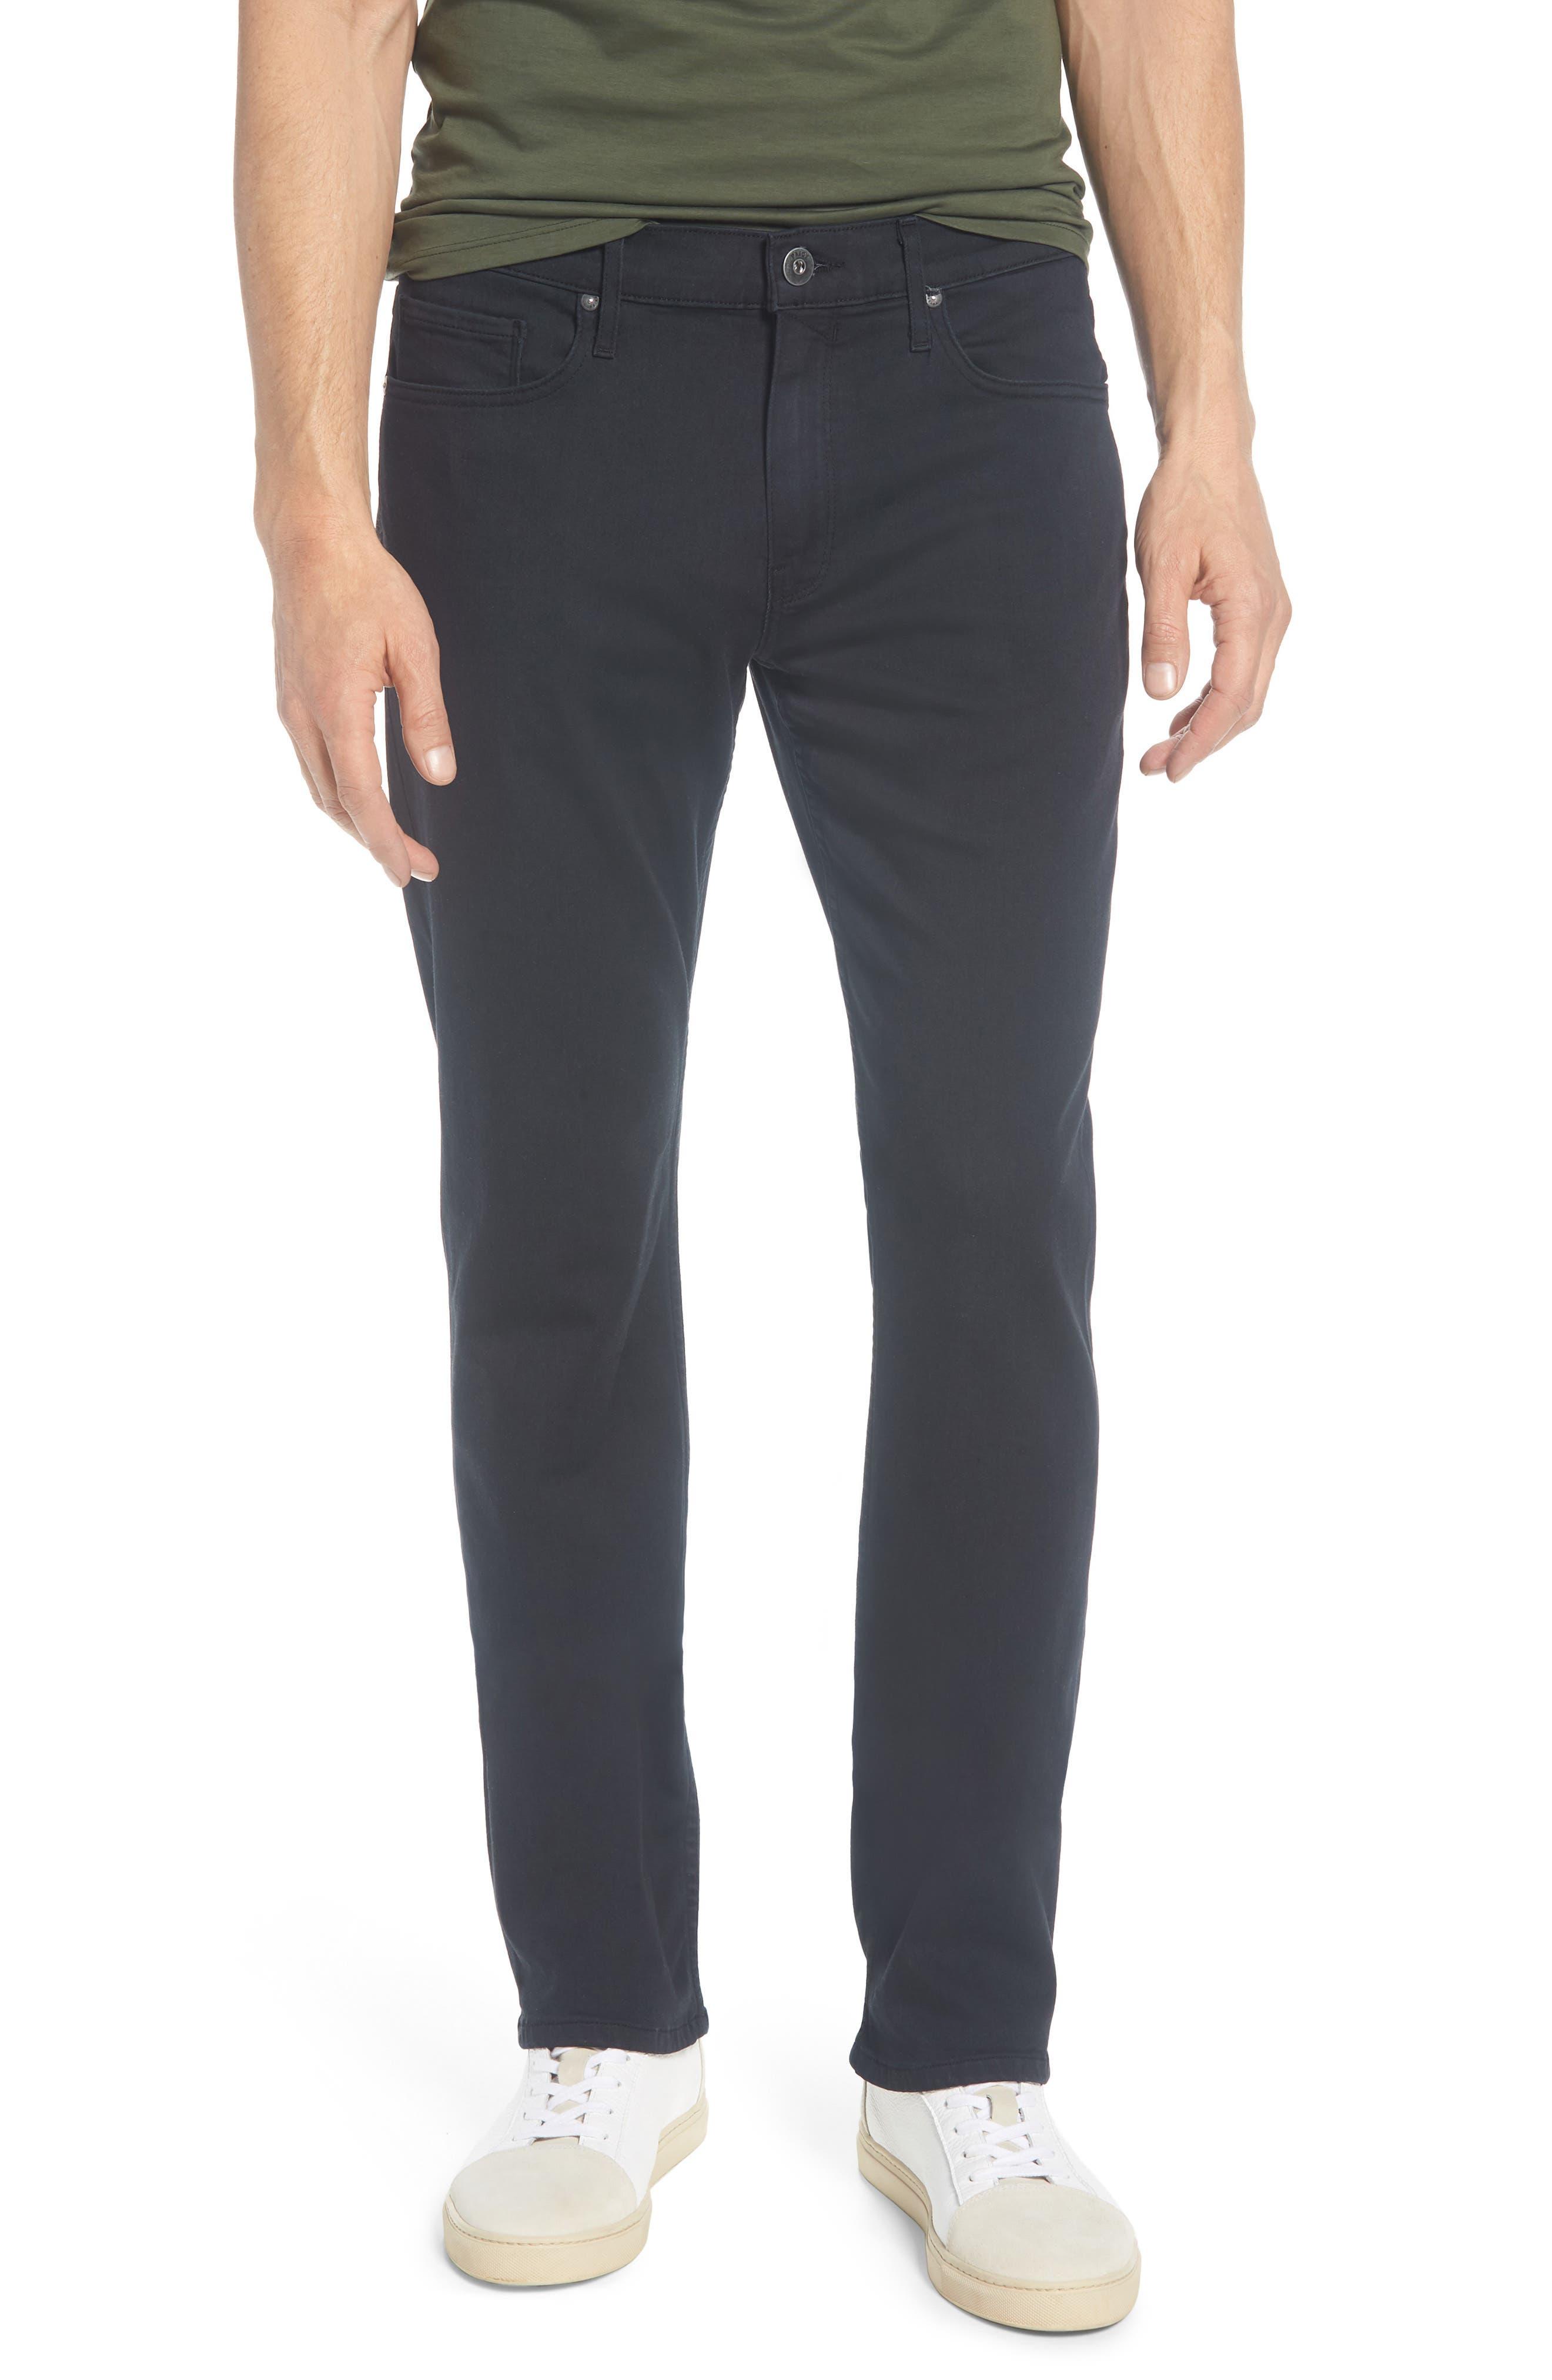 Normandie Straight Leg Jeans,                             Main thumbnail 1, color,                             Jeff